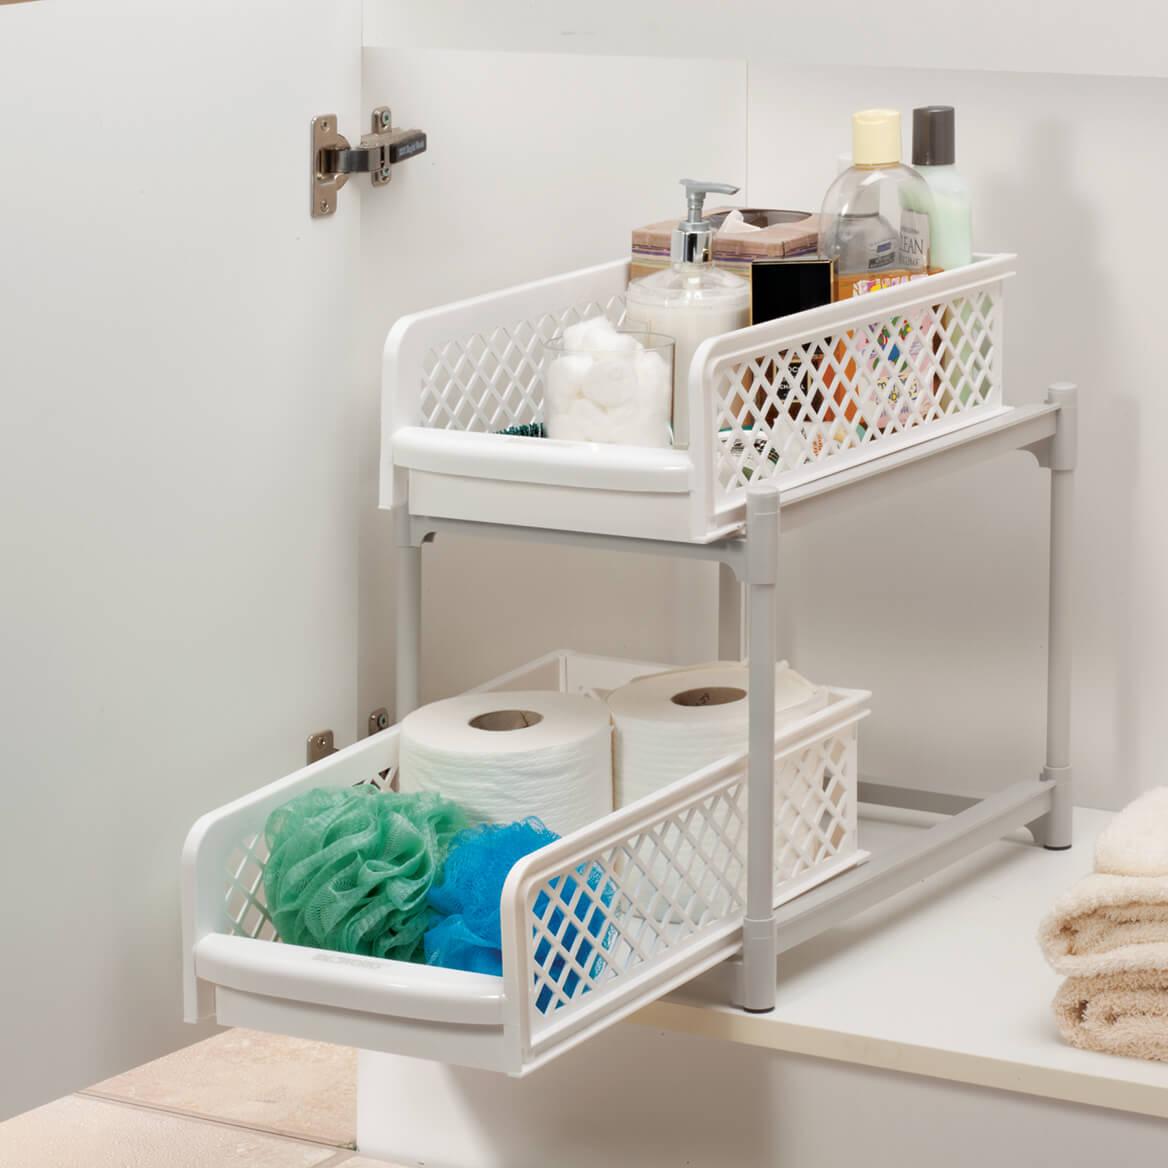 9 Inch Two Tier Sliding Storage Drawers 361364 Kitchen